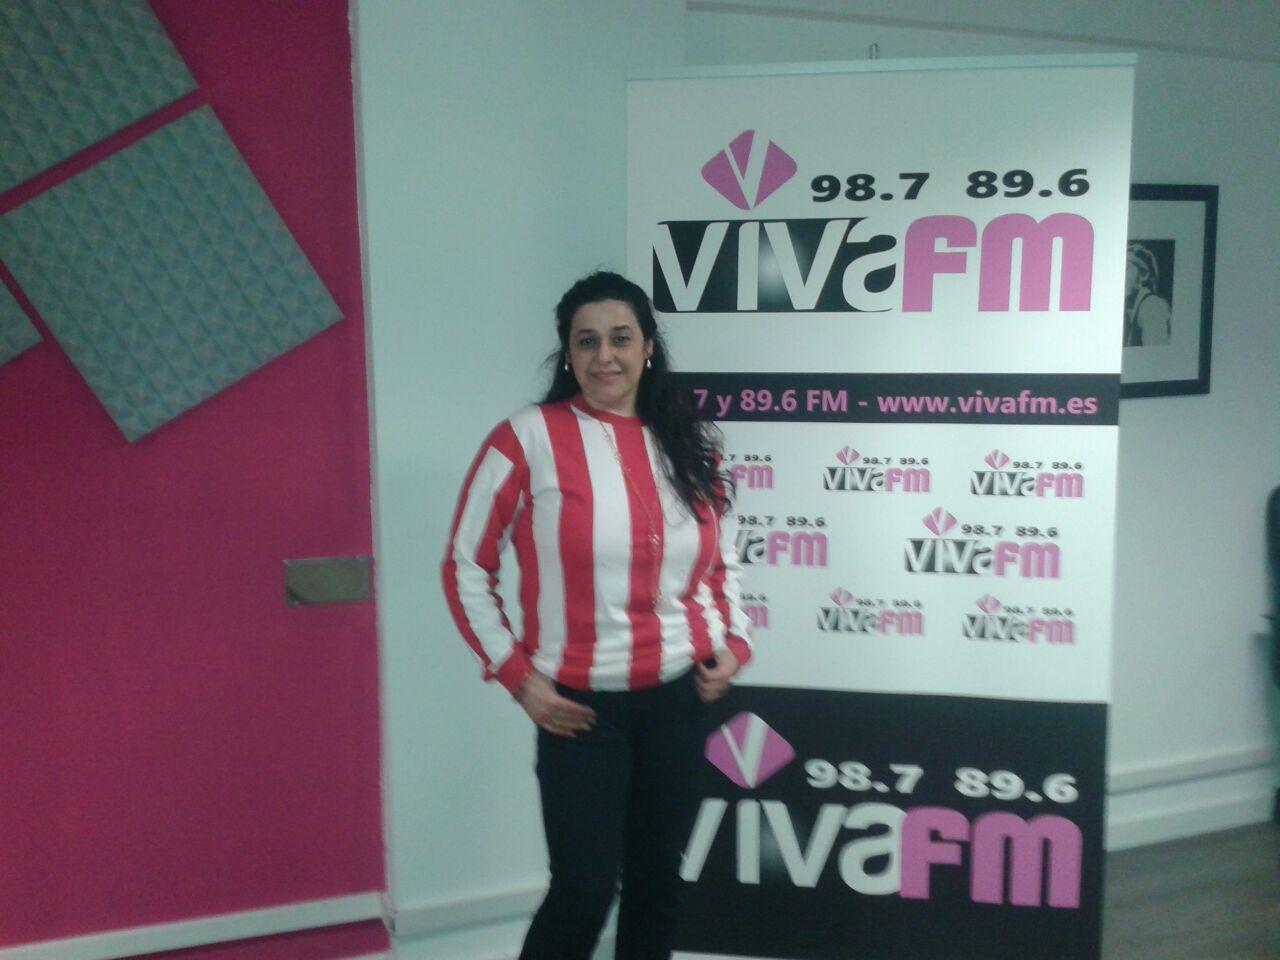 Entrevista en VIVA fM ASTURIAS